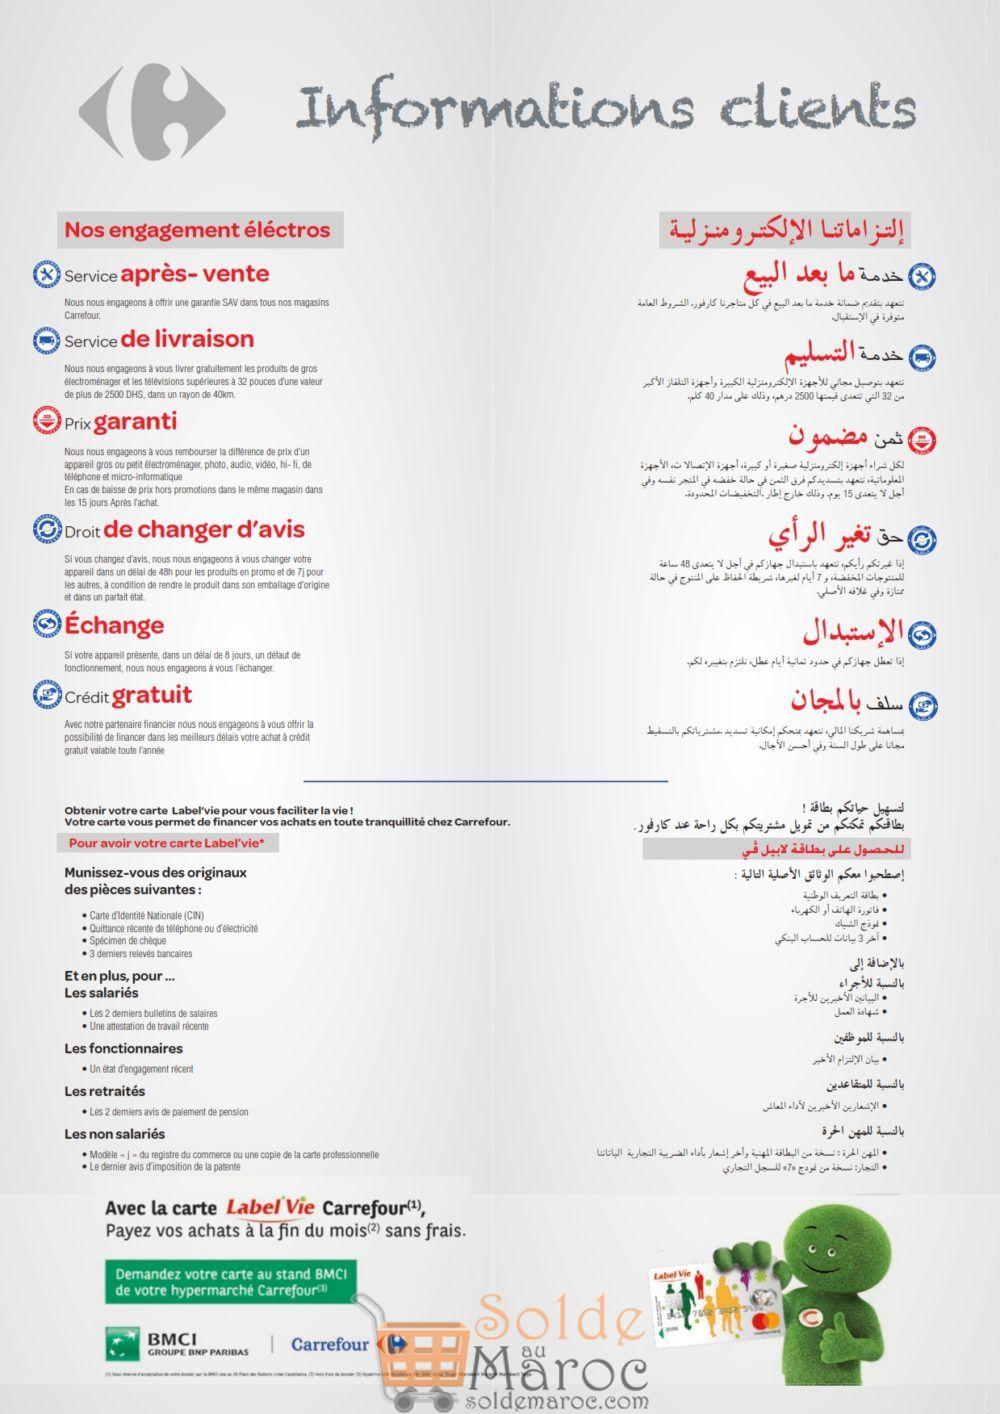 Carte Carrefour Maroc.Catalogue Carrefour Maroc Speciale Rentree Scolaire Solde